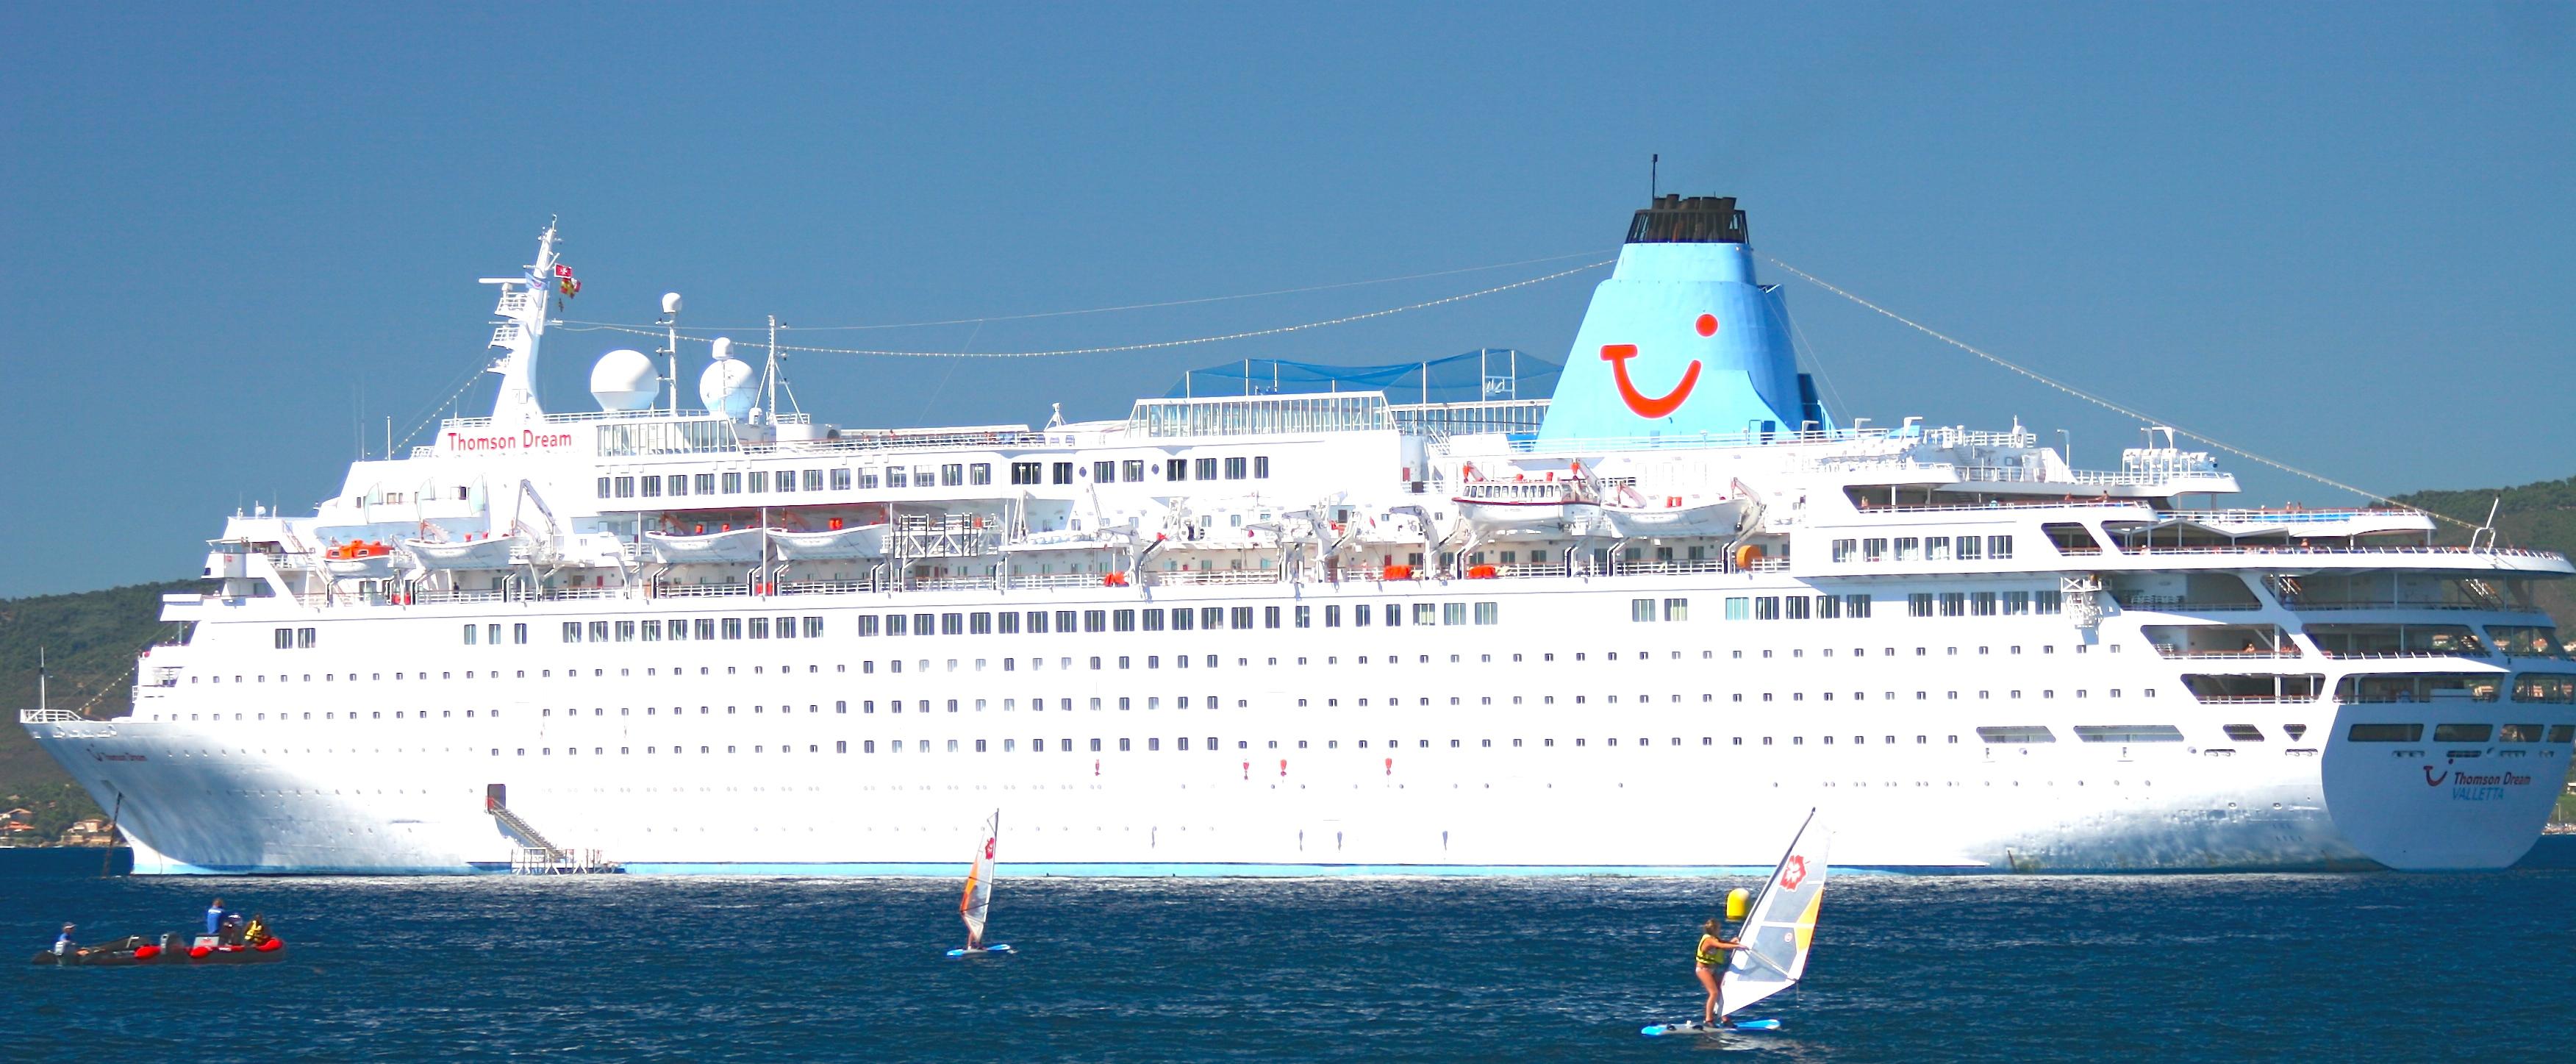 Cruising To SaintRaphael AzurAlive - The thomson dream cruise ship